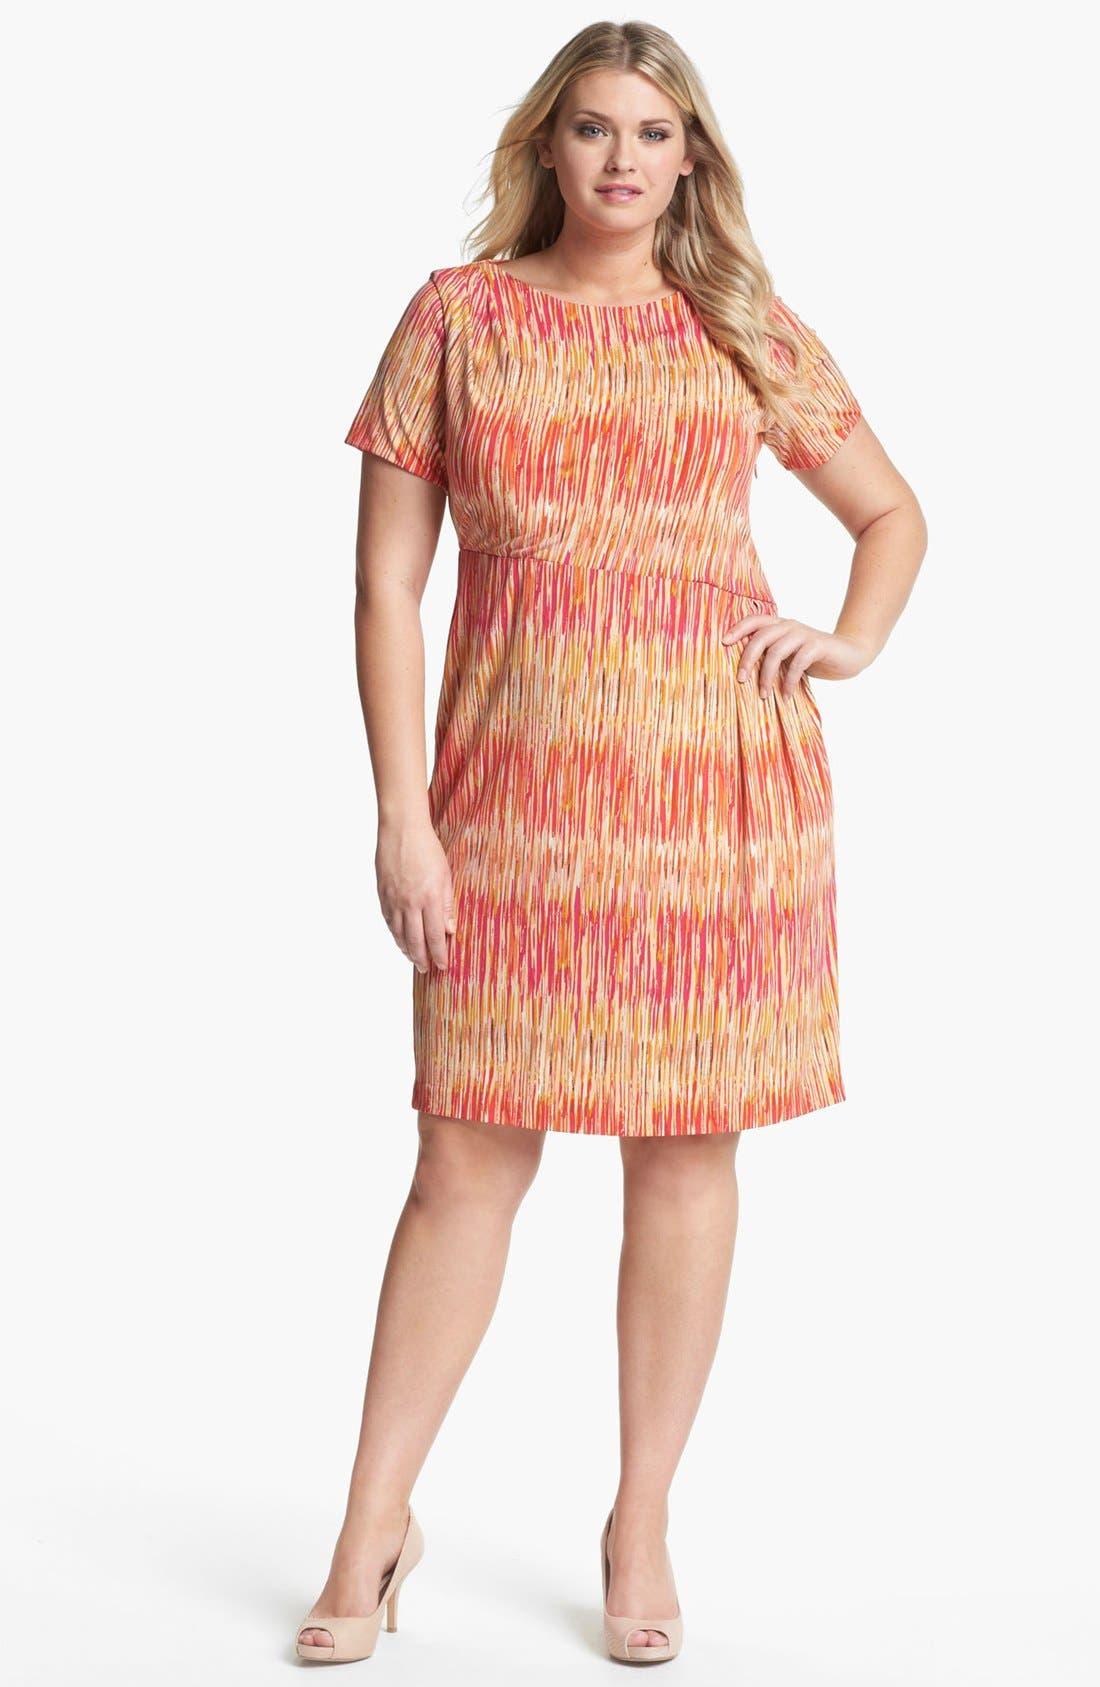 Alternate Image 1 Selected - Vince Camuto Print Sheath Dress (Plus Size)